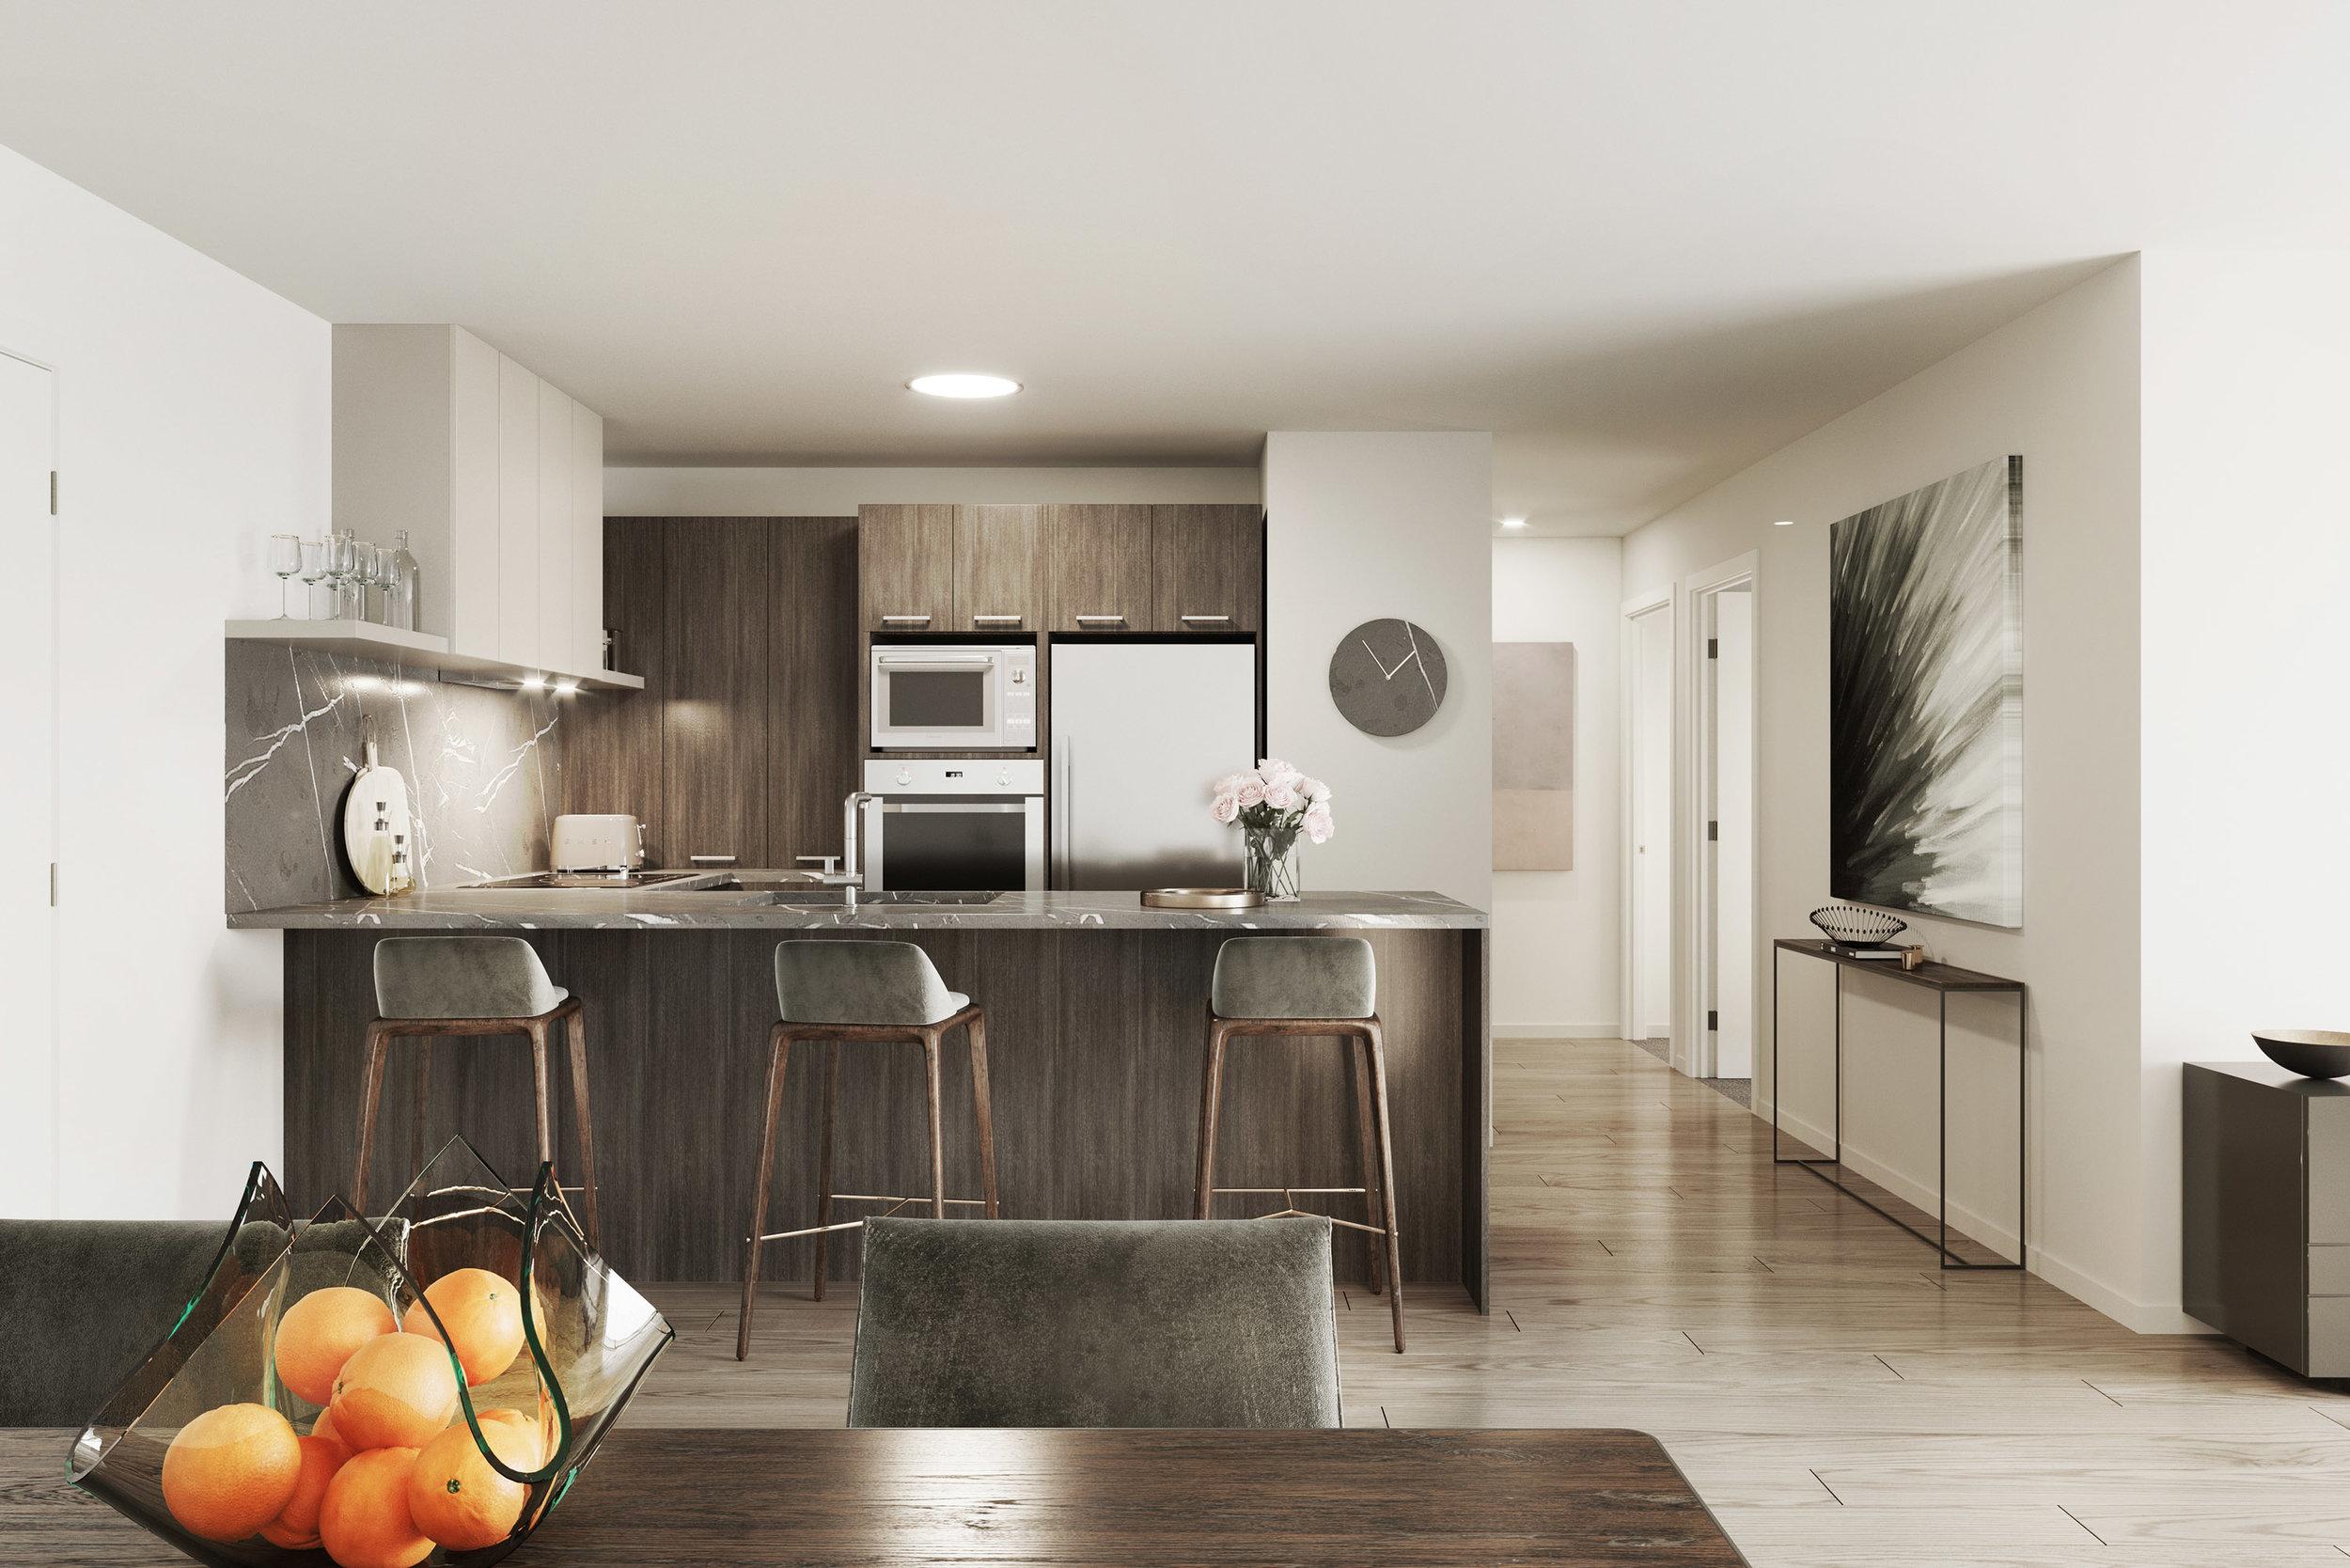 Hobson Quarter_Int_Zone_M_A2.2_Kitchen_Final01_website.jpg